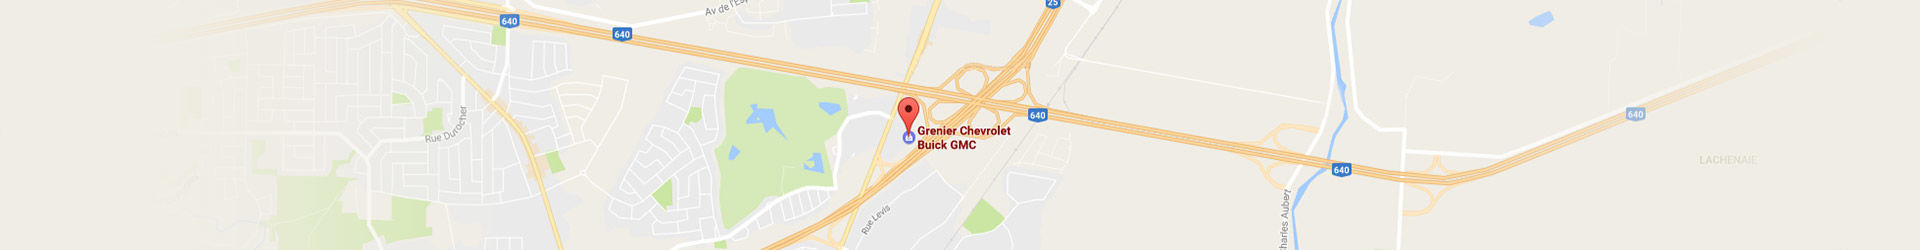 Grenier Chevrolet